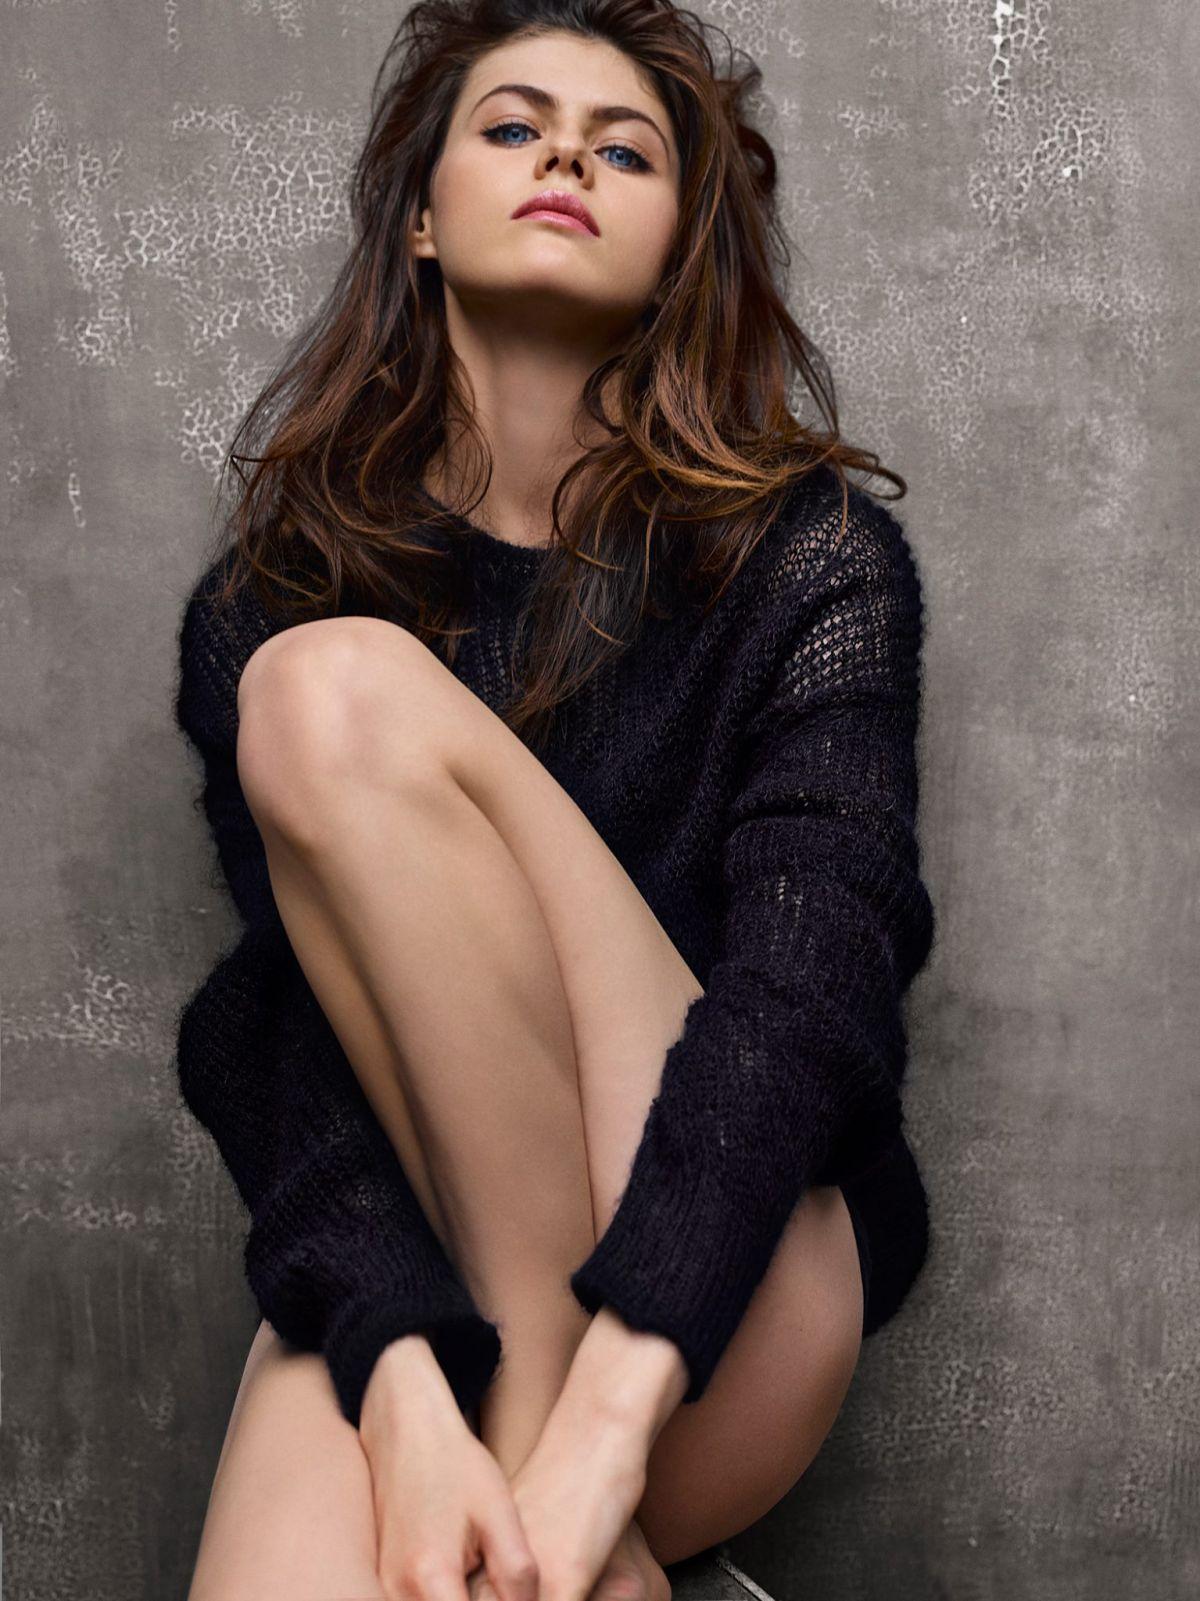 Picture of Alexandra Daddario